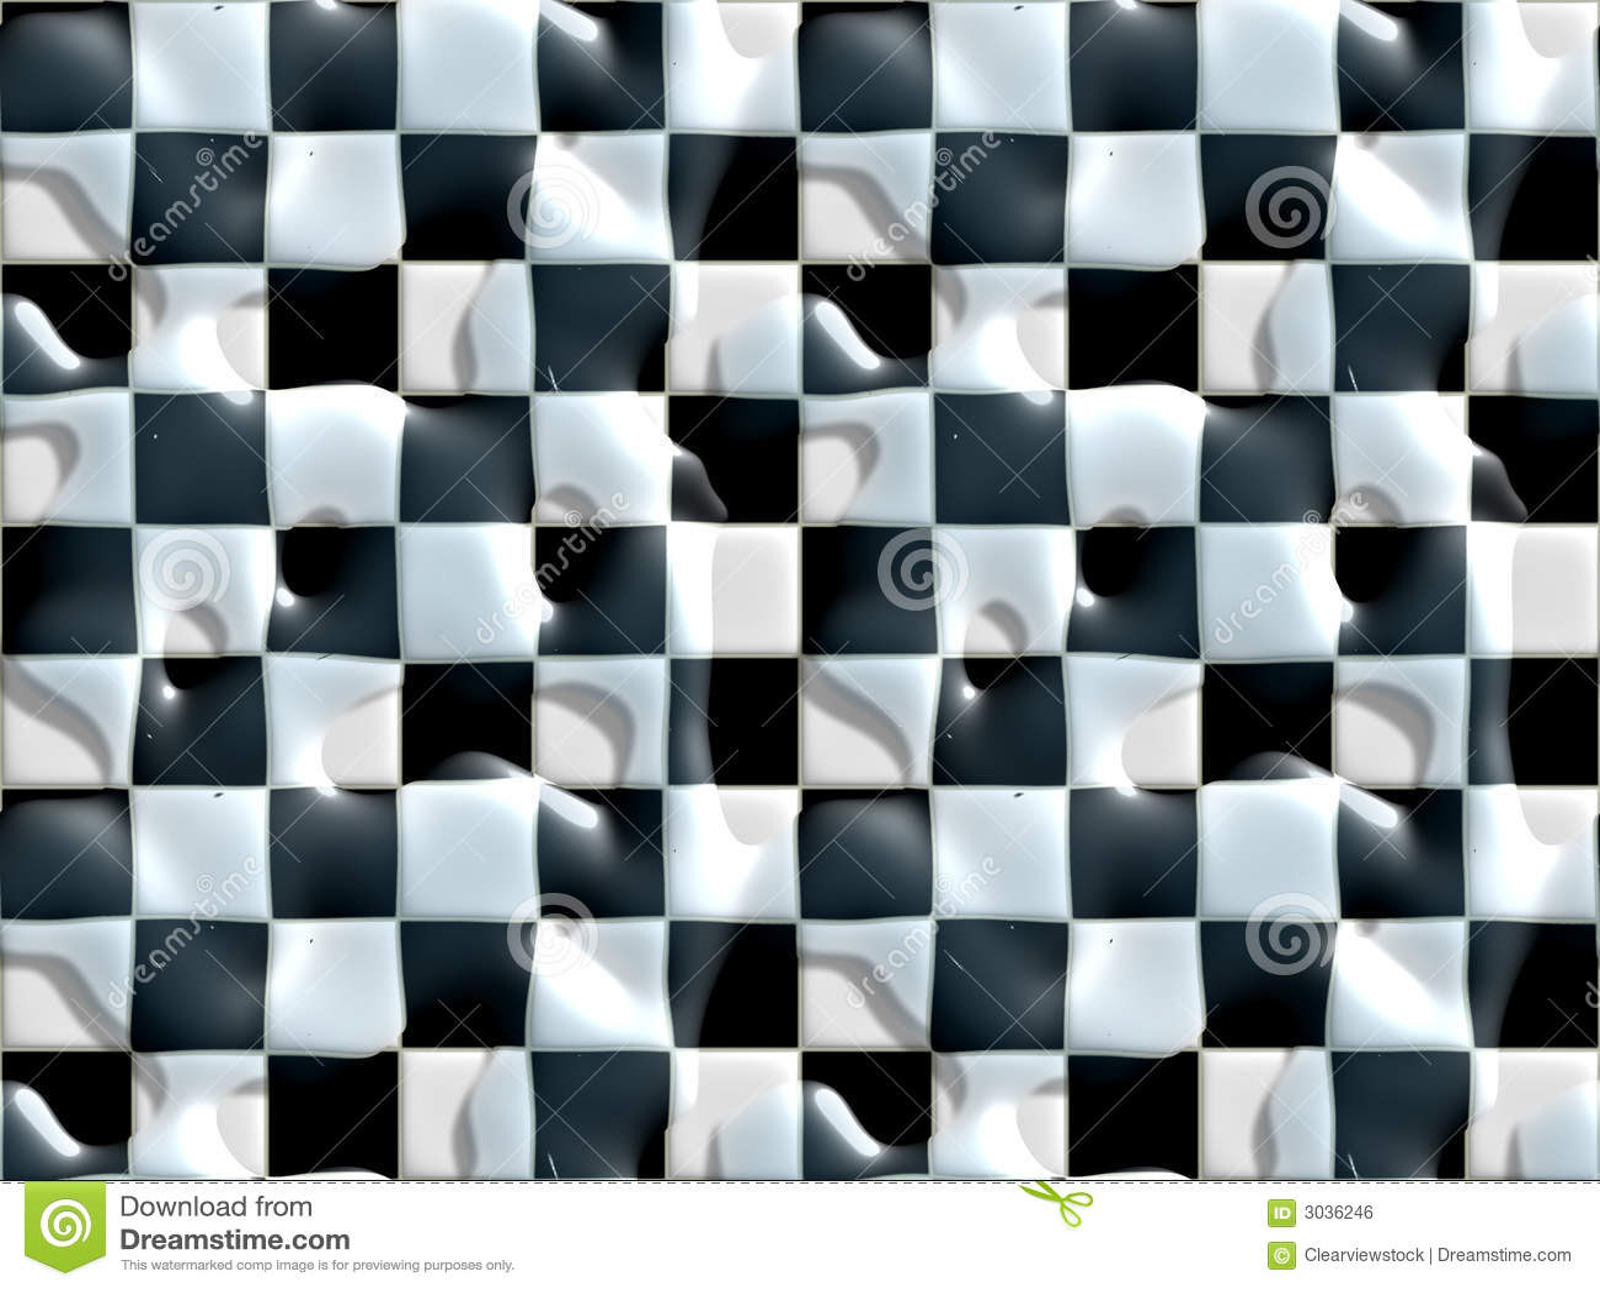 Wet Floor Black White Tiles Royalty Free Stock Image - Image: 3036246